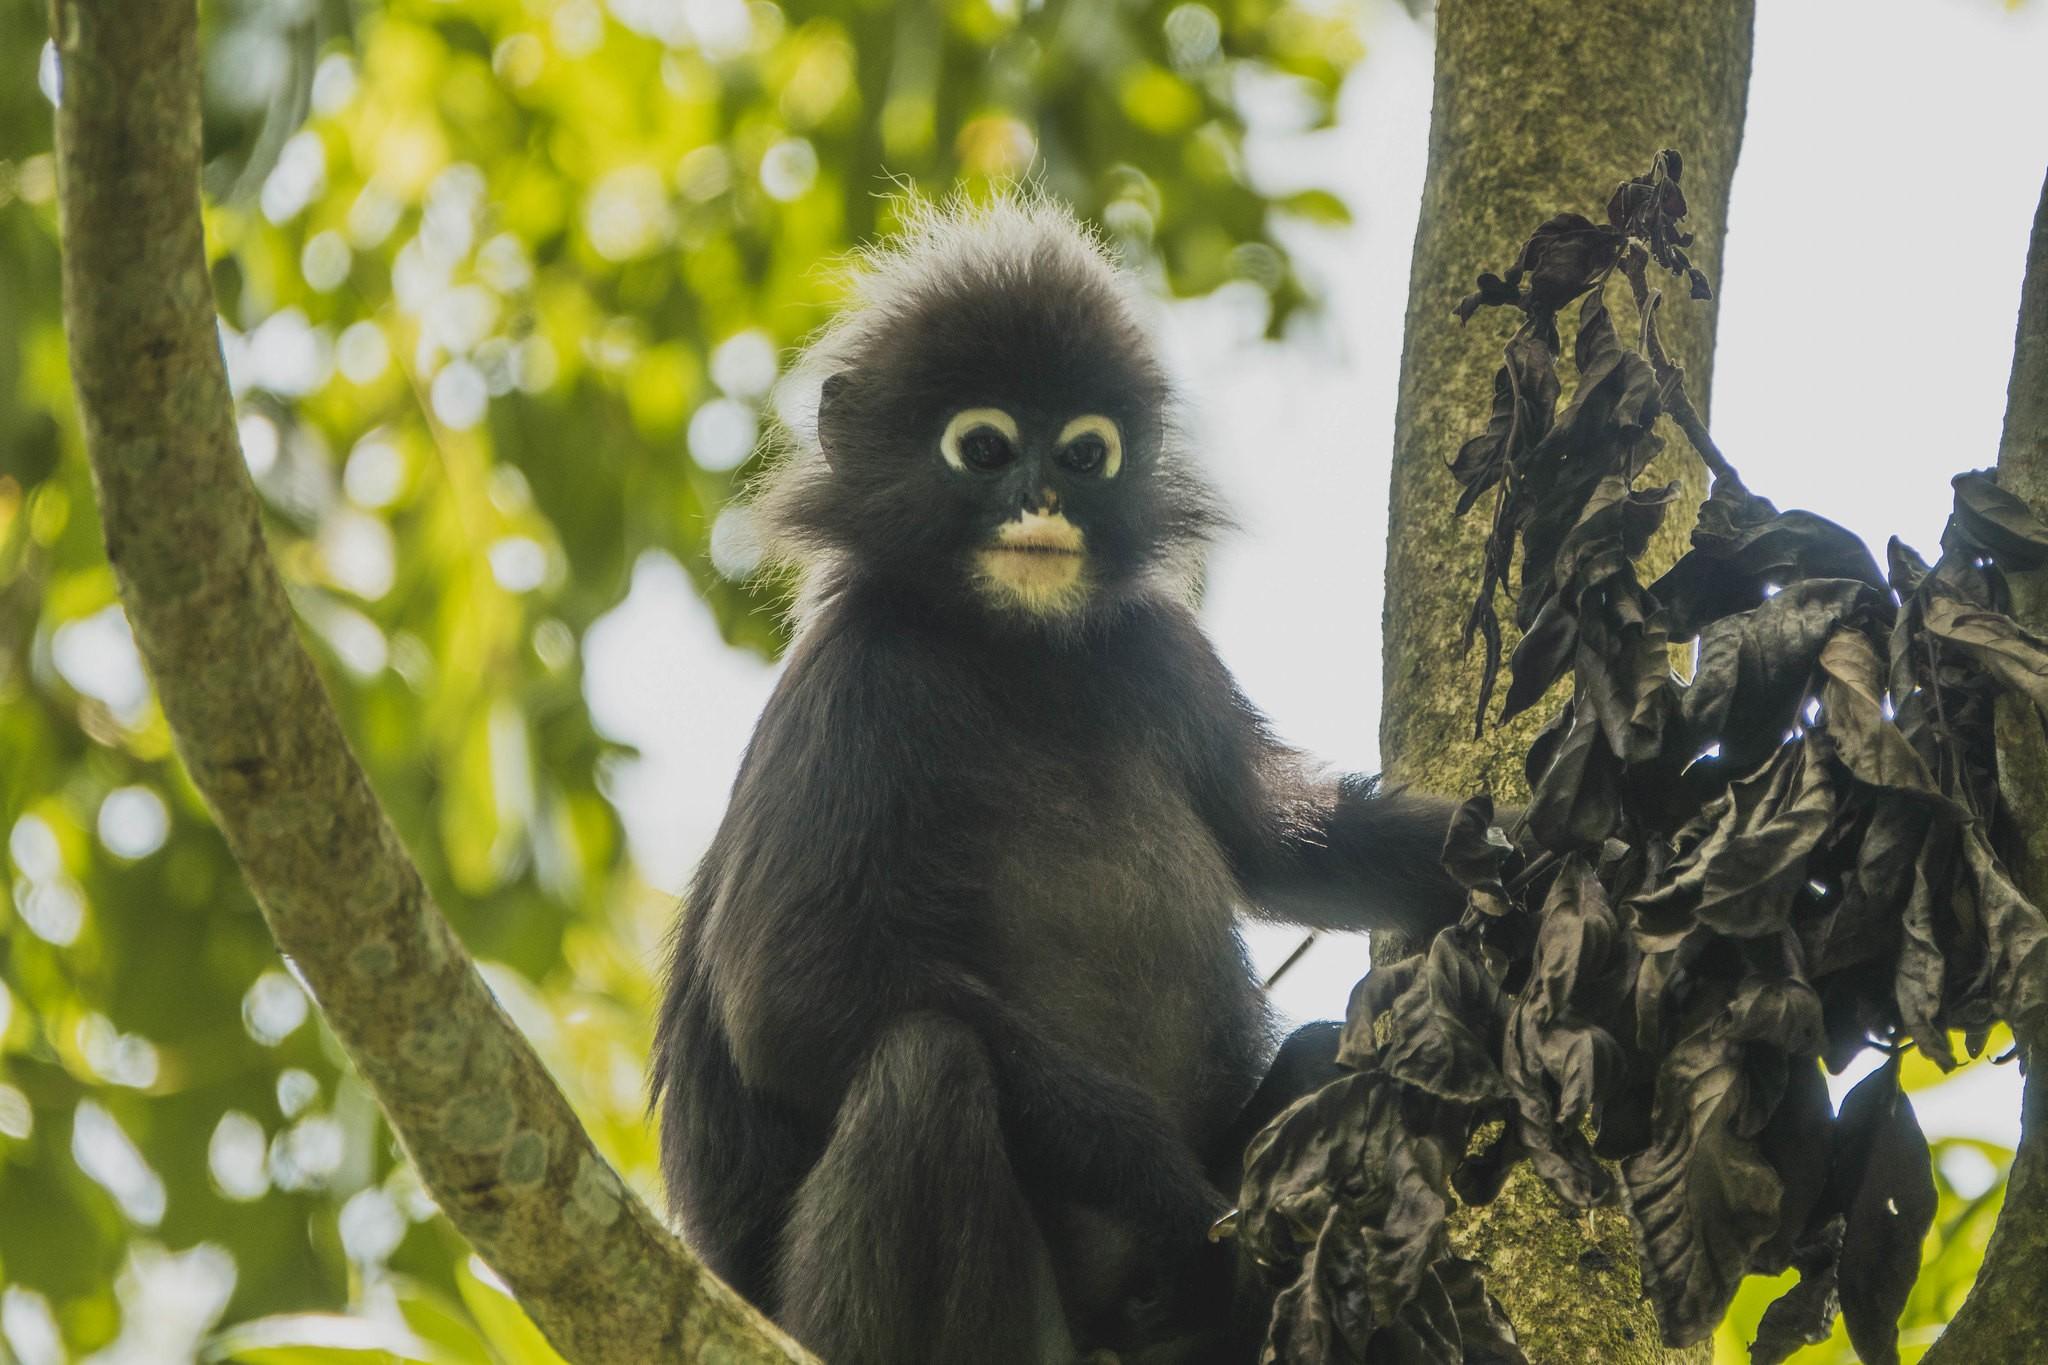 The Habitat Penang Hill: Diverse Rainforest Experience